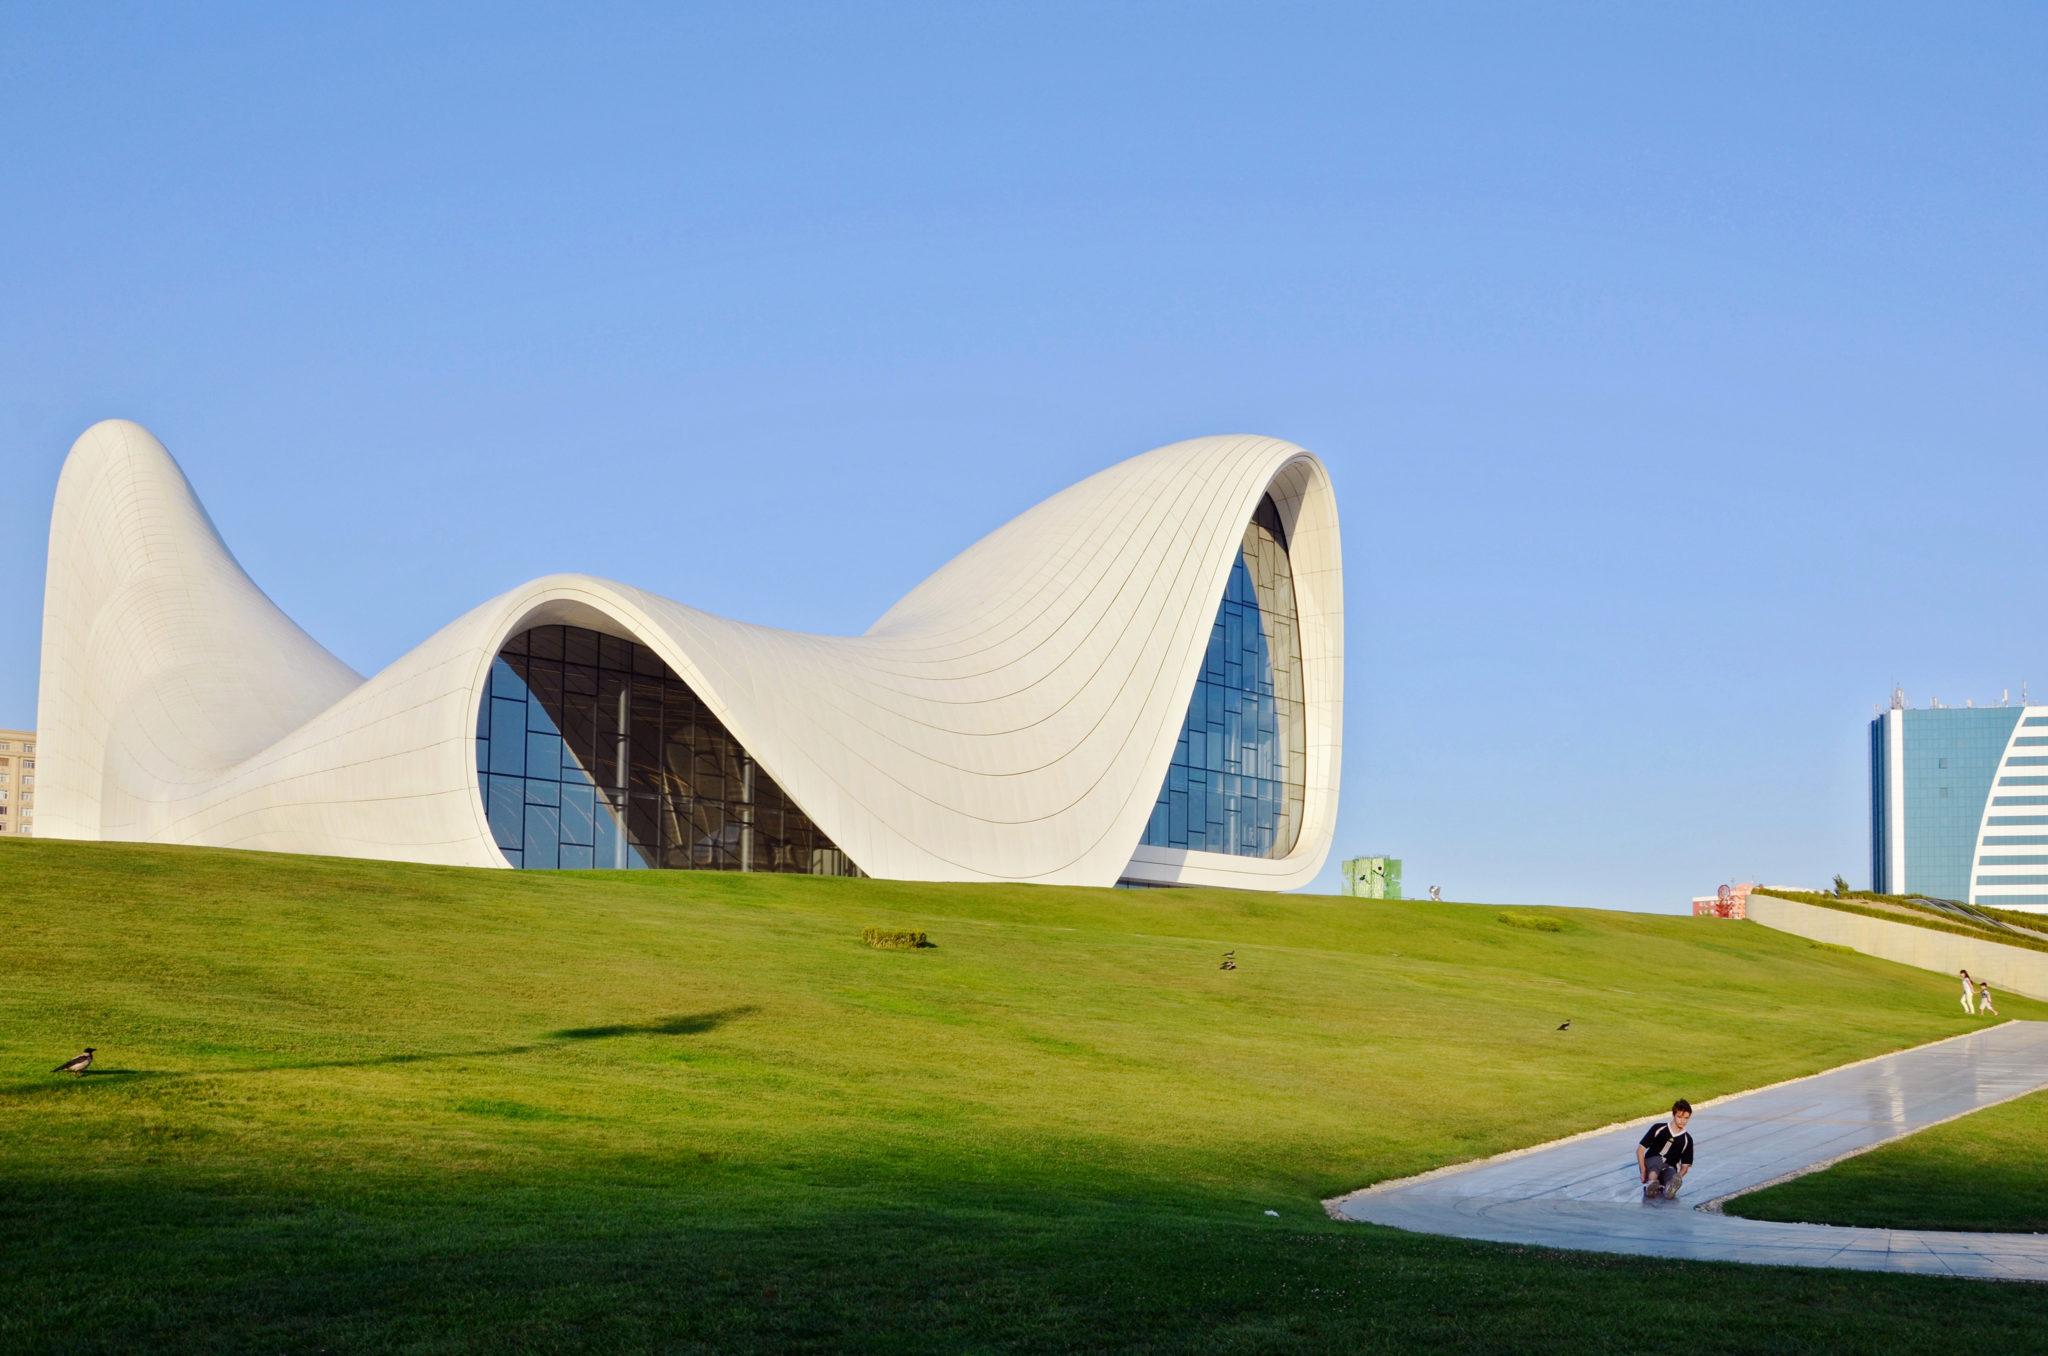 Heydar Aliyev Center von Architektin Zaha Hadid